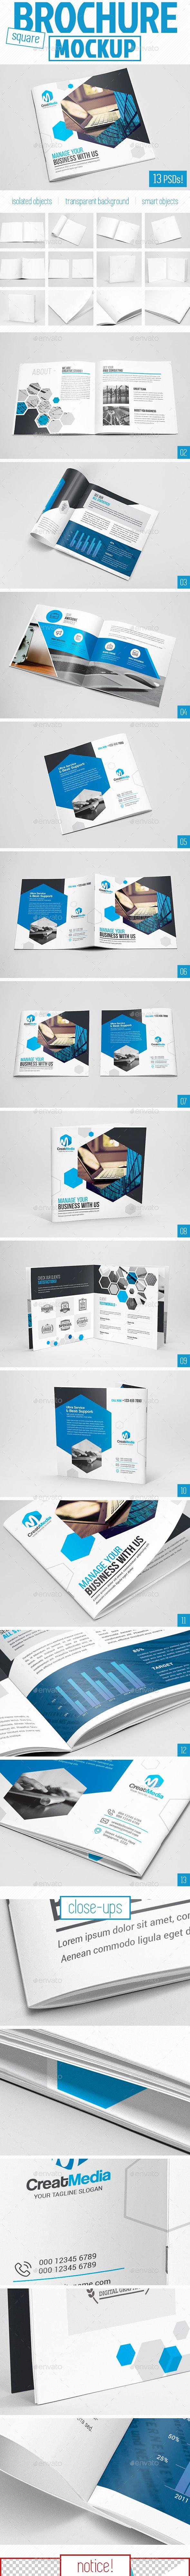 Square Brochure Mockup - Brochures Print